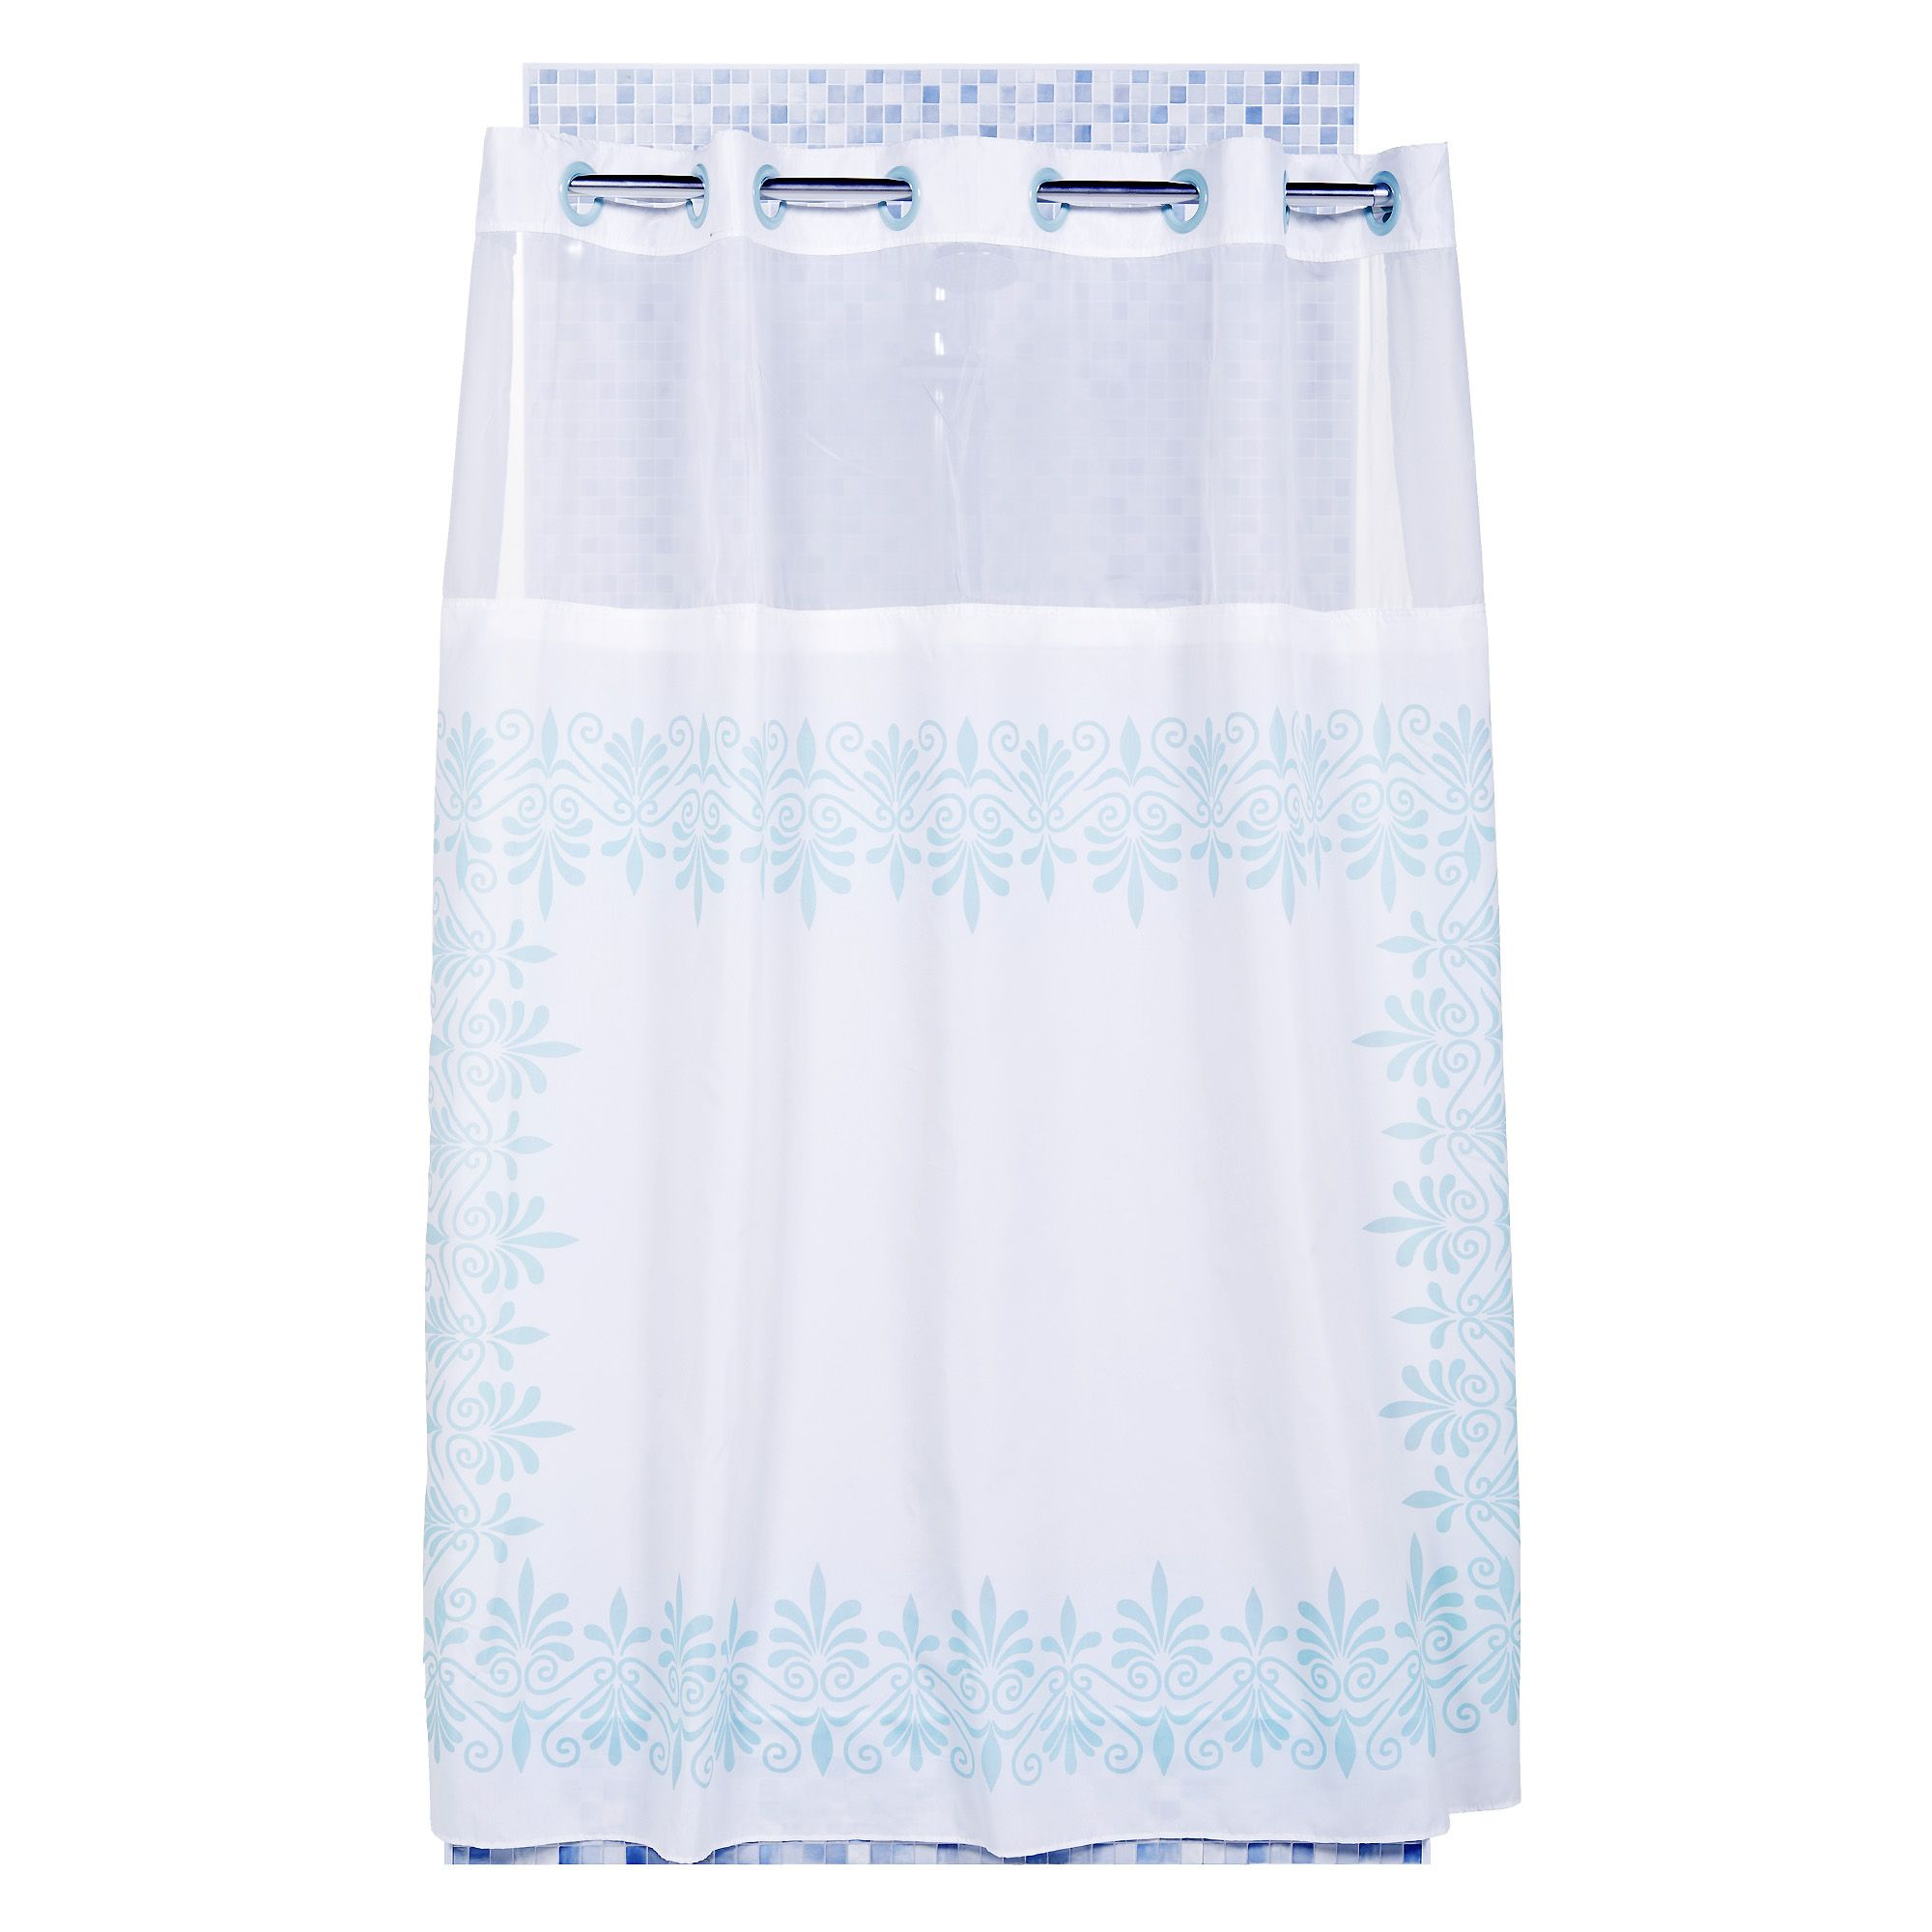 Hookless tenda per doccia senza ganci in tessuto con - Tende per doccia in tessuto ...